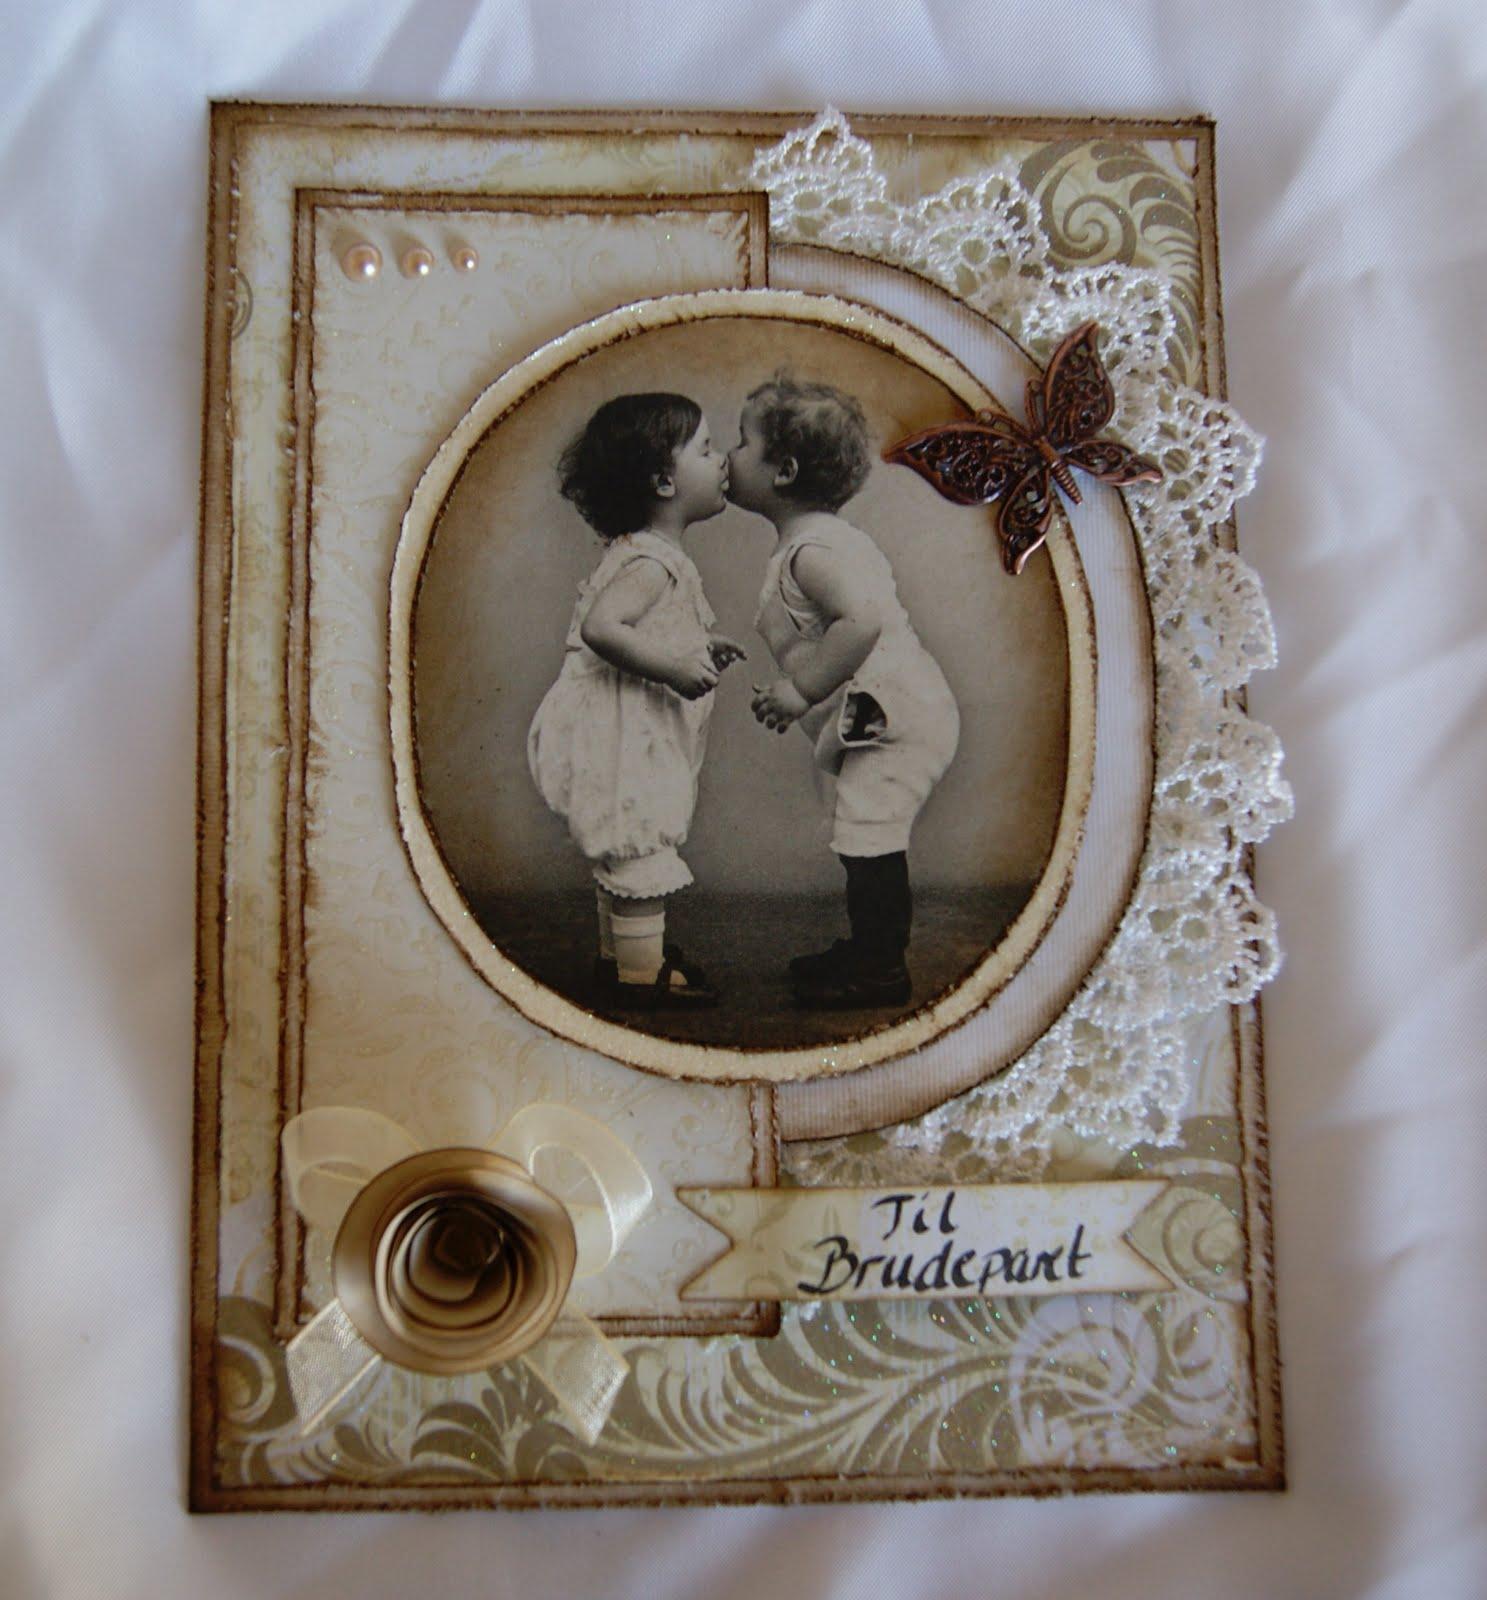 How to scrapbook wedding cards - How To Scrapbook Wedding Cards 20